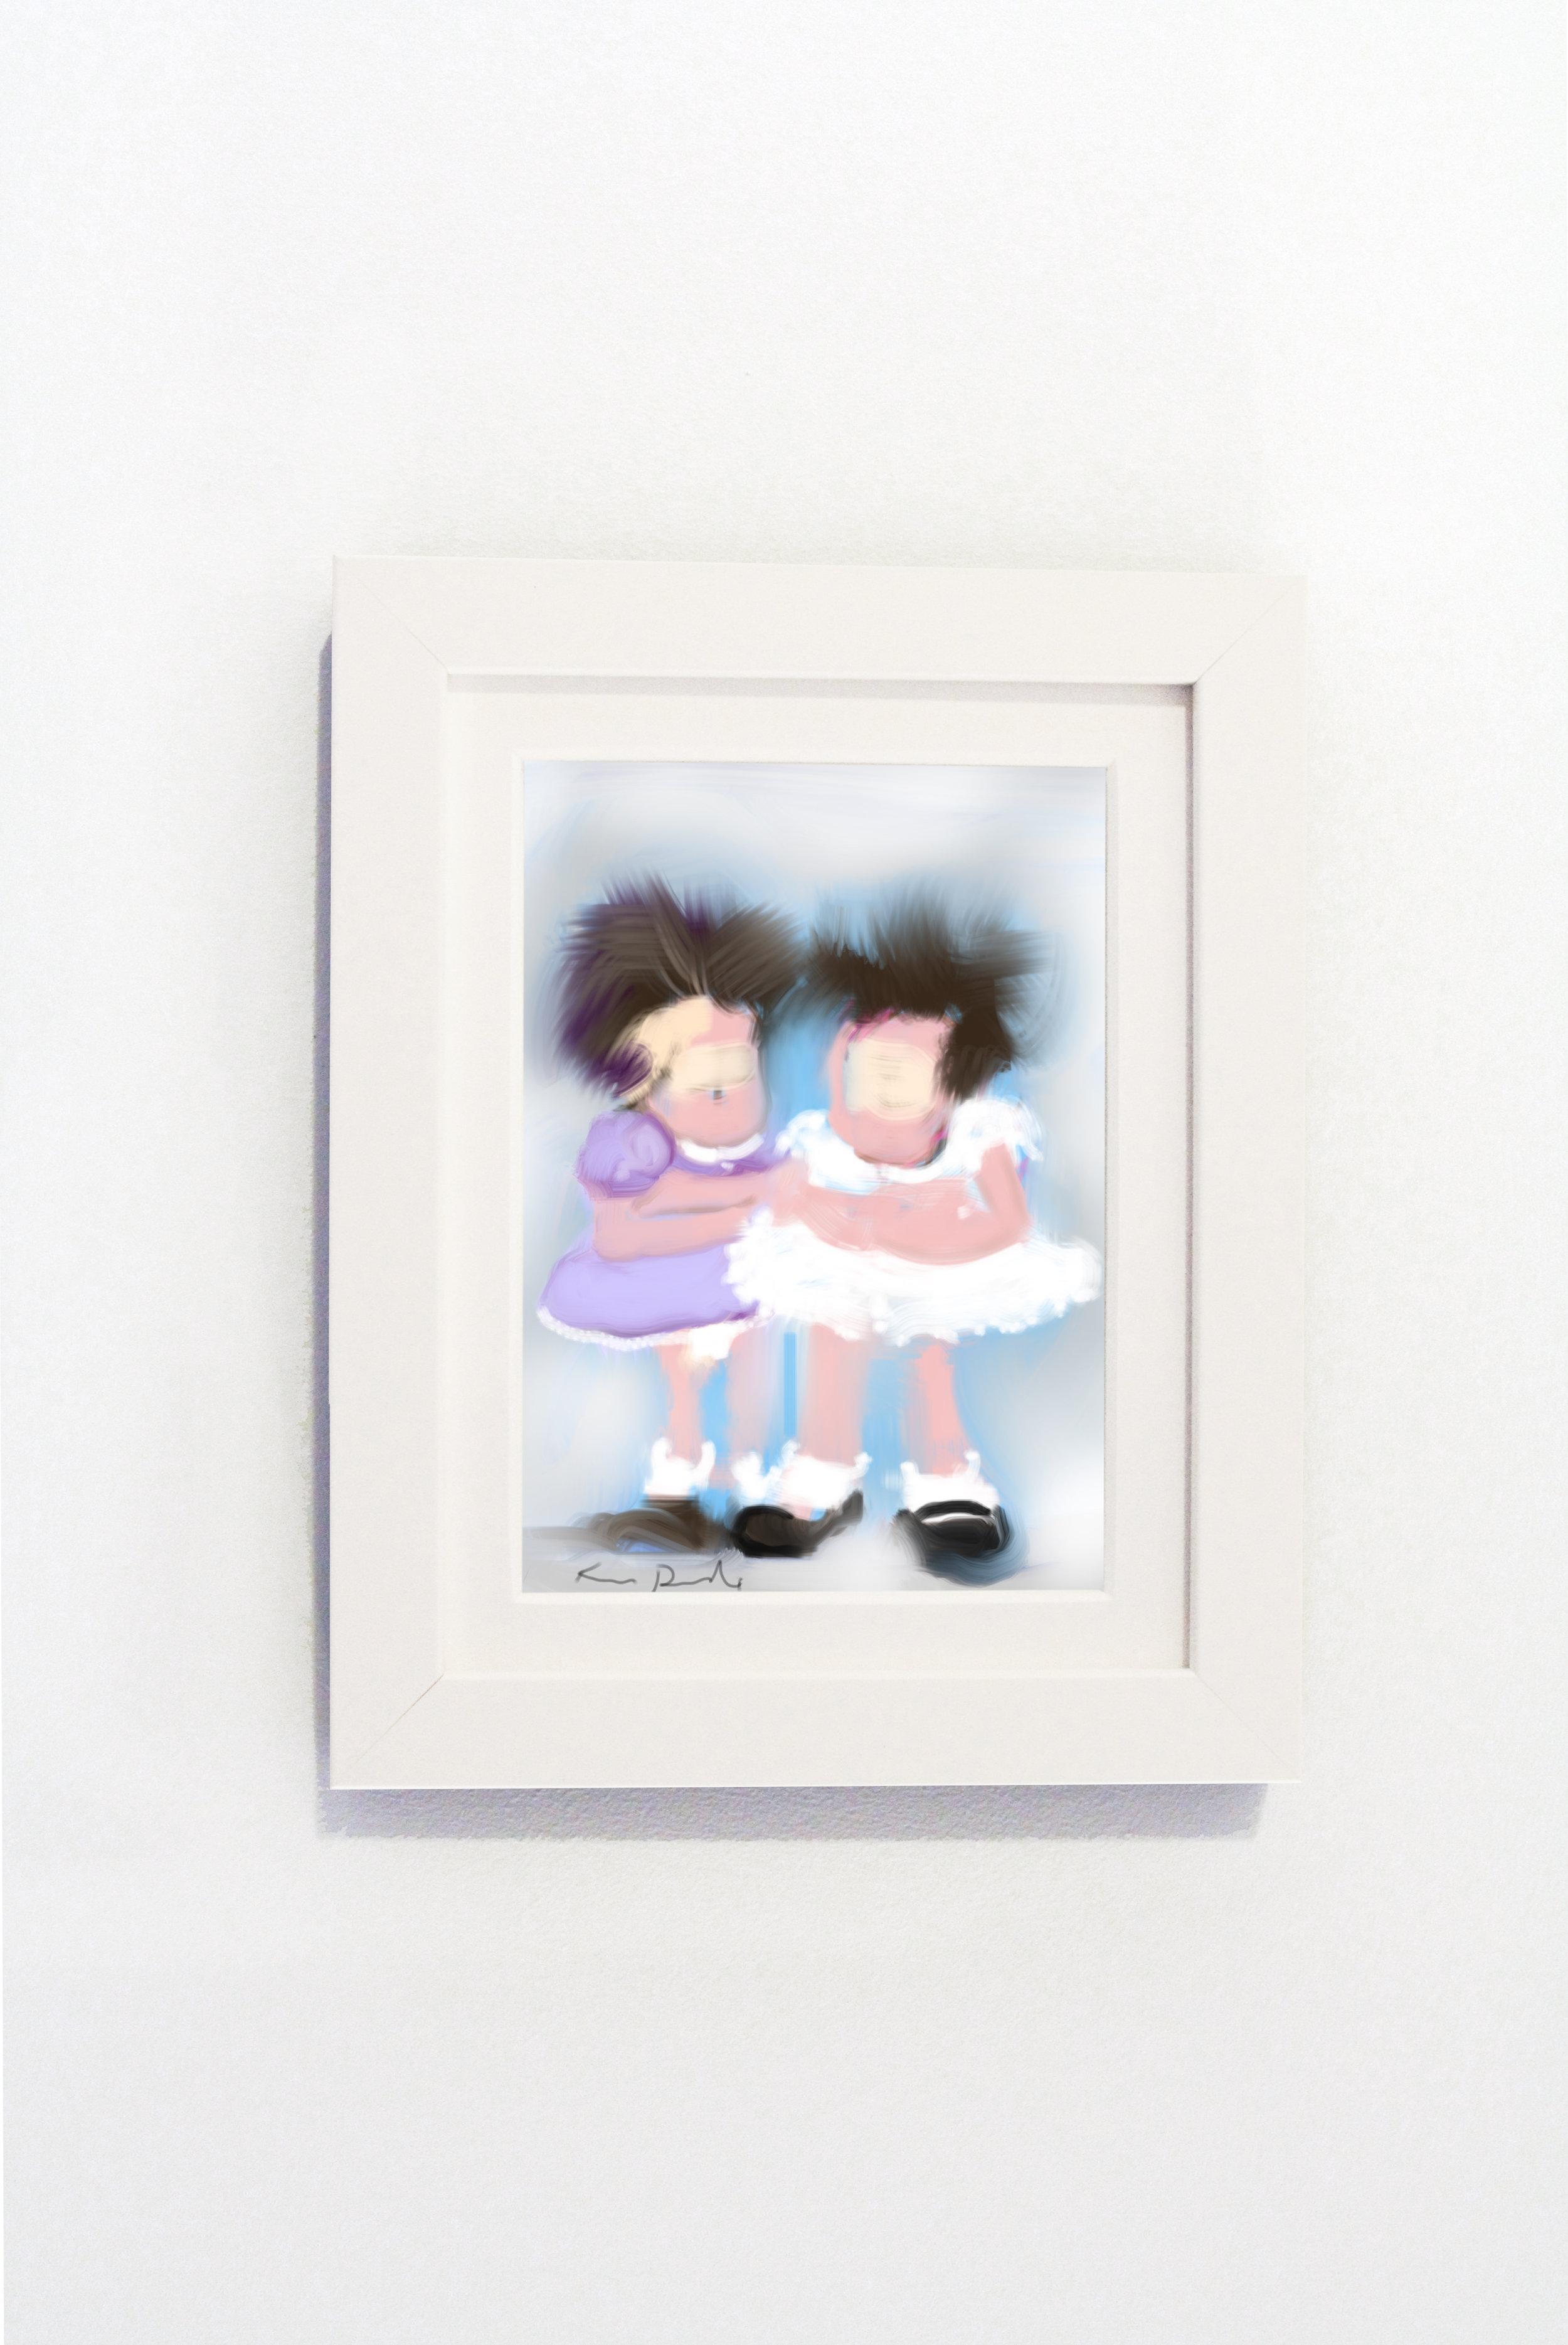 Ipad Drawing White Frame.jpg